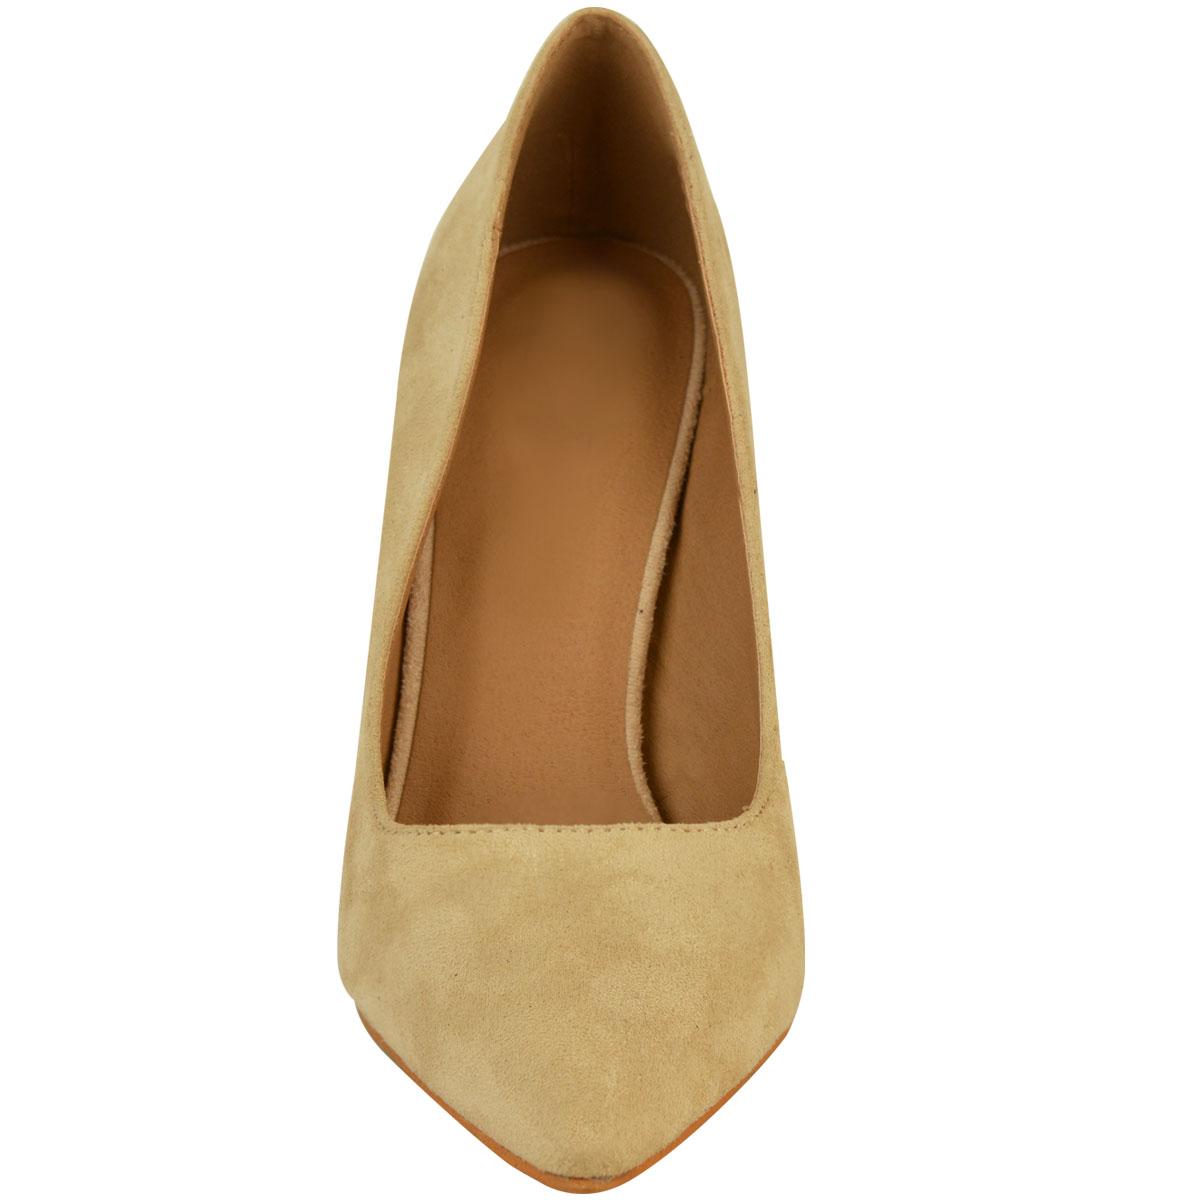 Ladies Womens Party High Heels Sandals